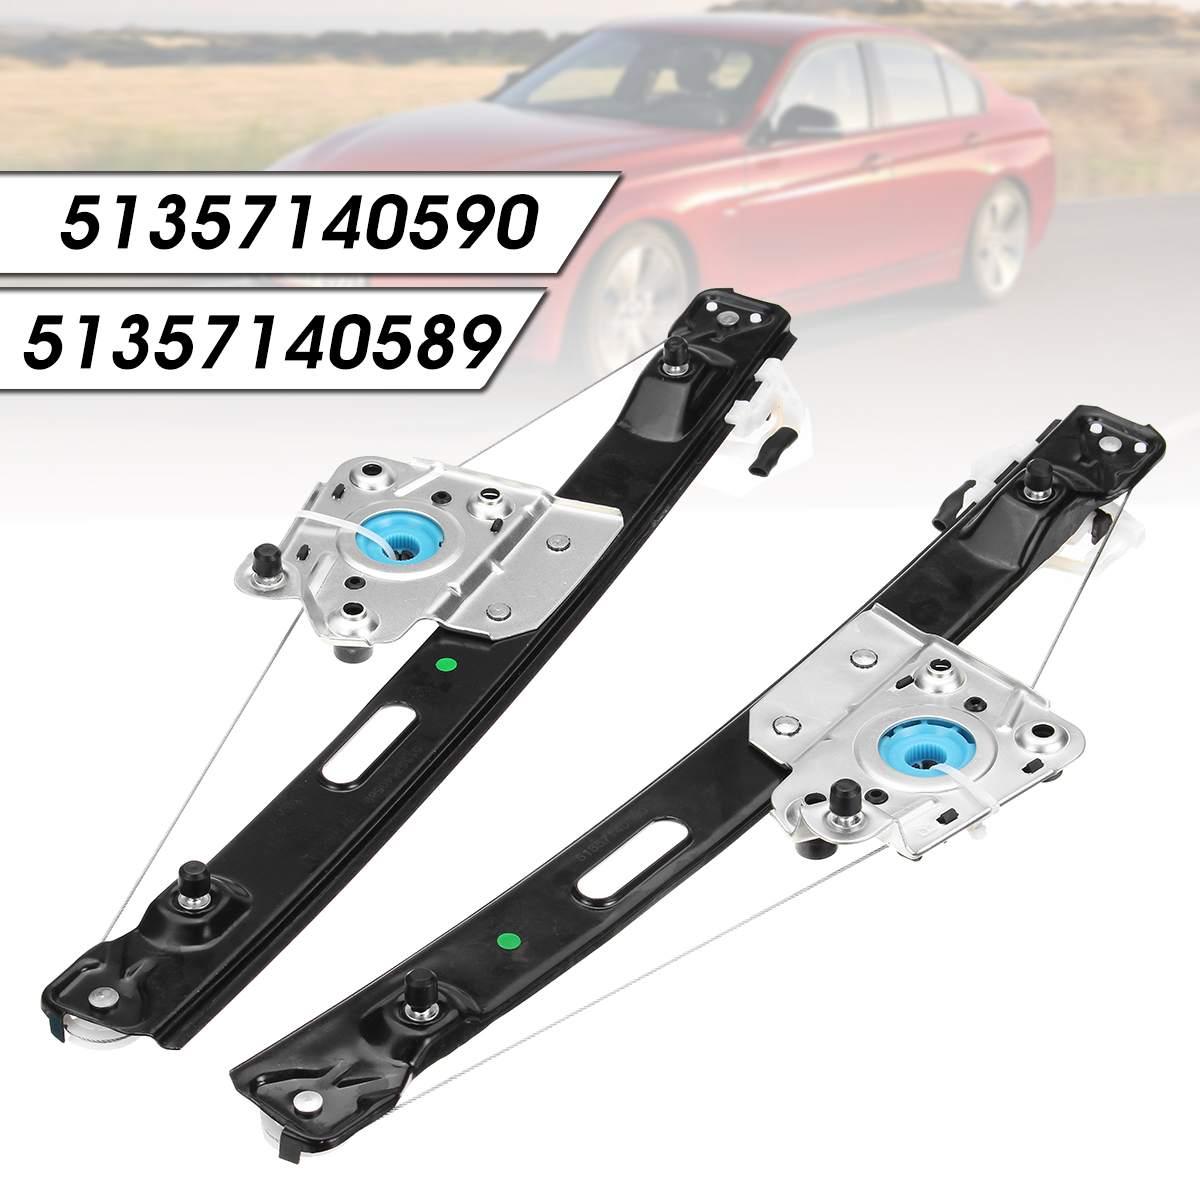 Rear Left / Right Power Window Regulator For BMW 3 Series E90 E91 323i 325i 325xi 328i xDrive 330xi Sedan 51357140589